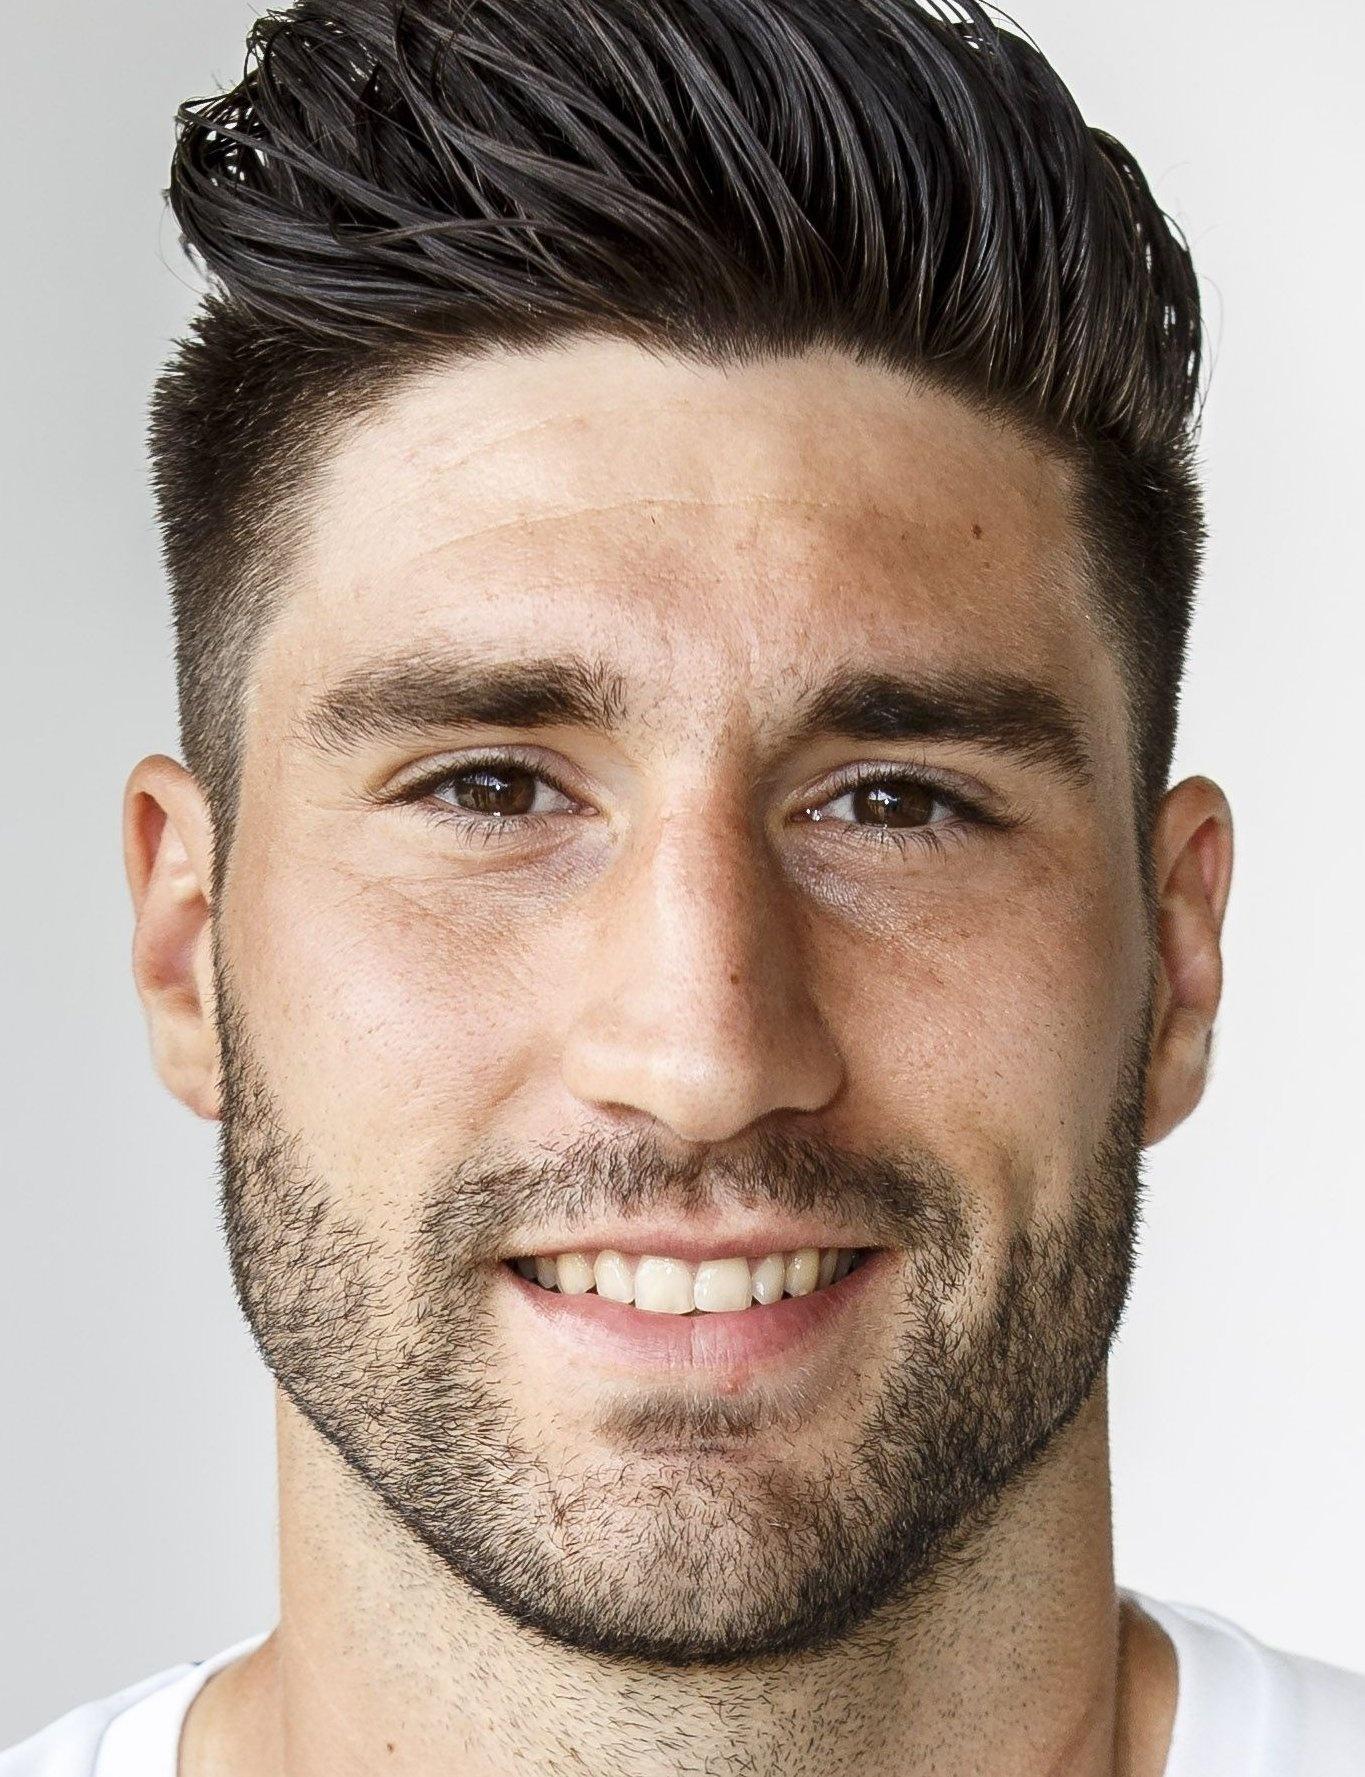 Fran S Nchez Player Profile 18 19 Transfermarkt